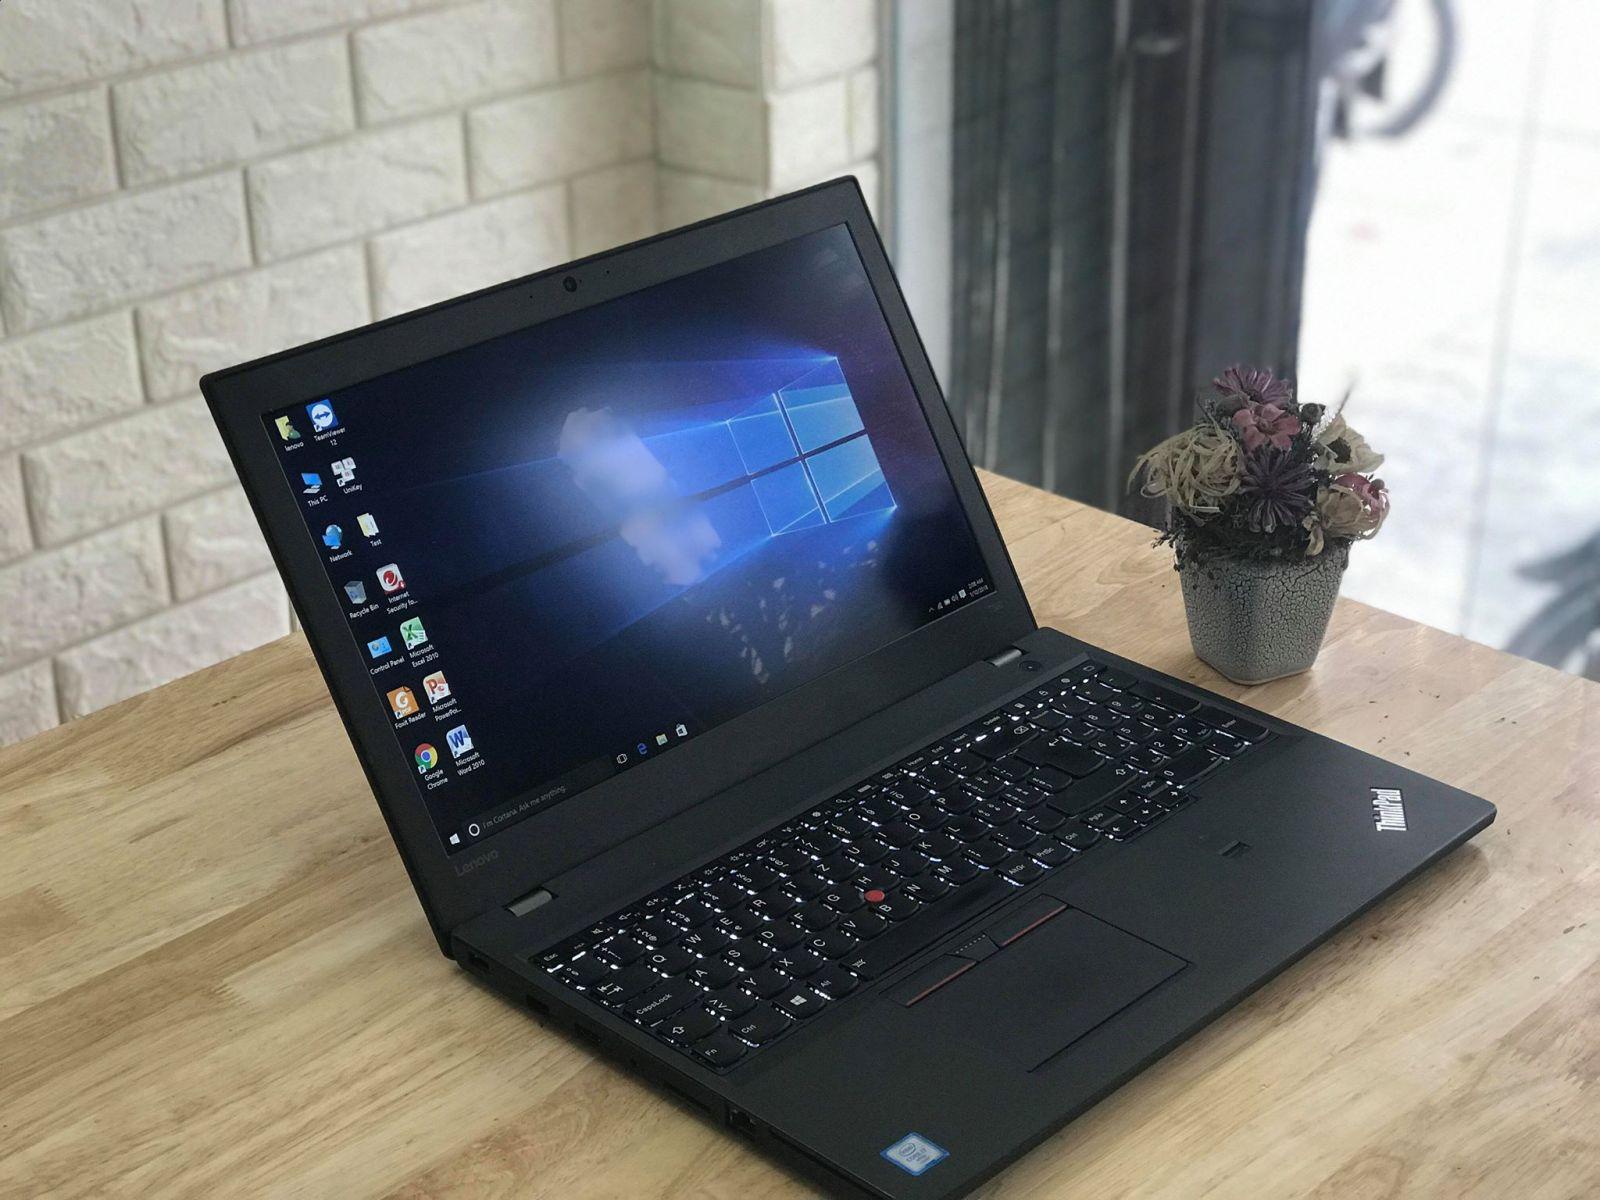 Lenovo ThinkPad T560 i7 6600U 8GB SSD 256GB 15.6″ 3K